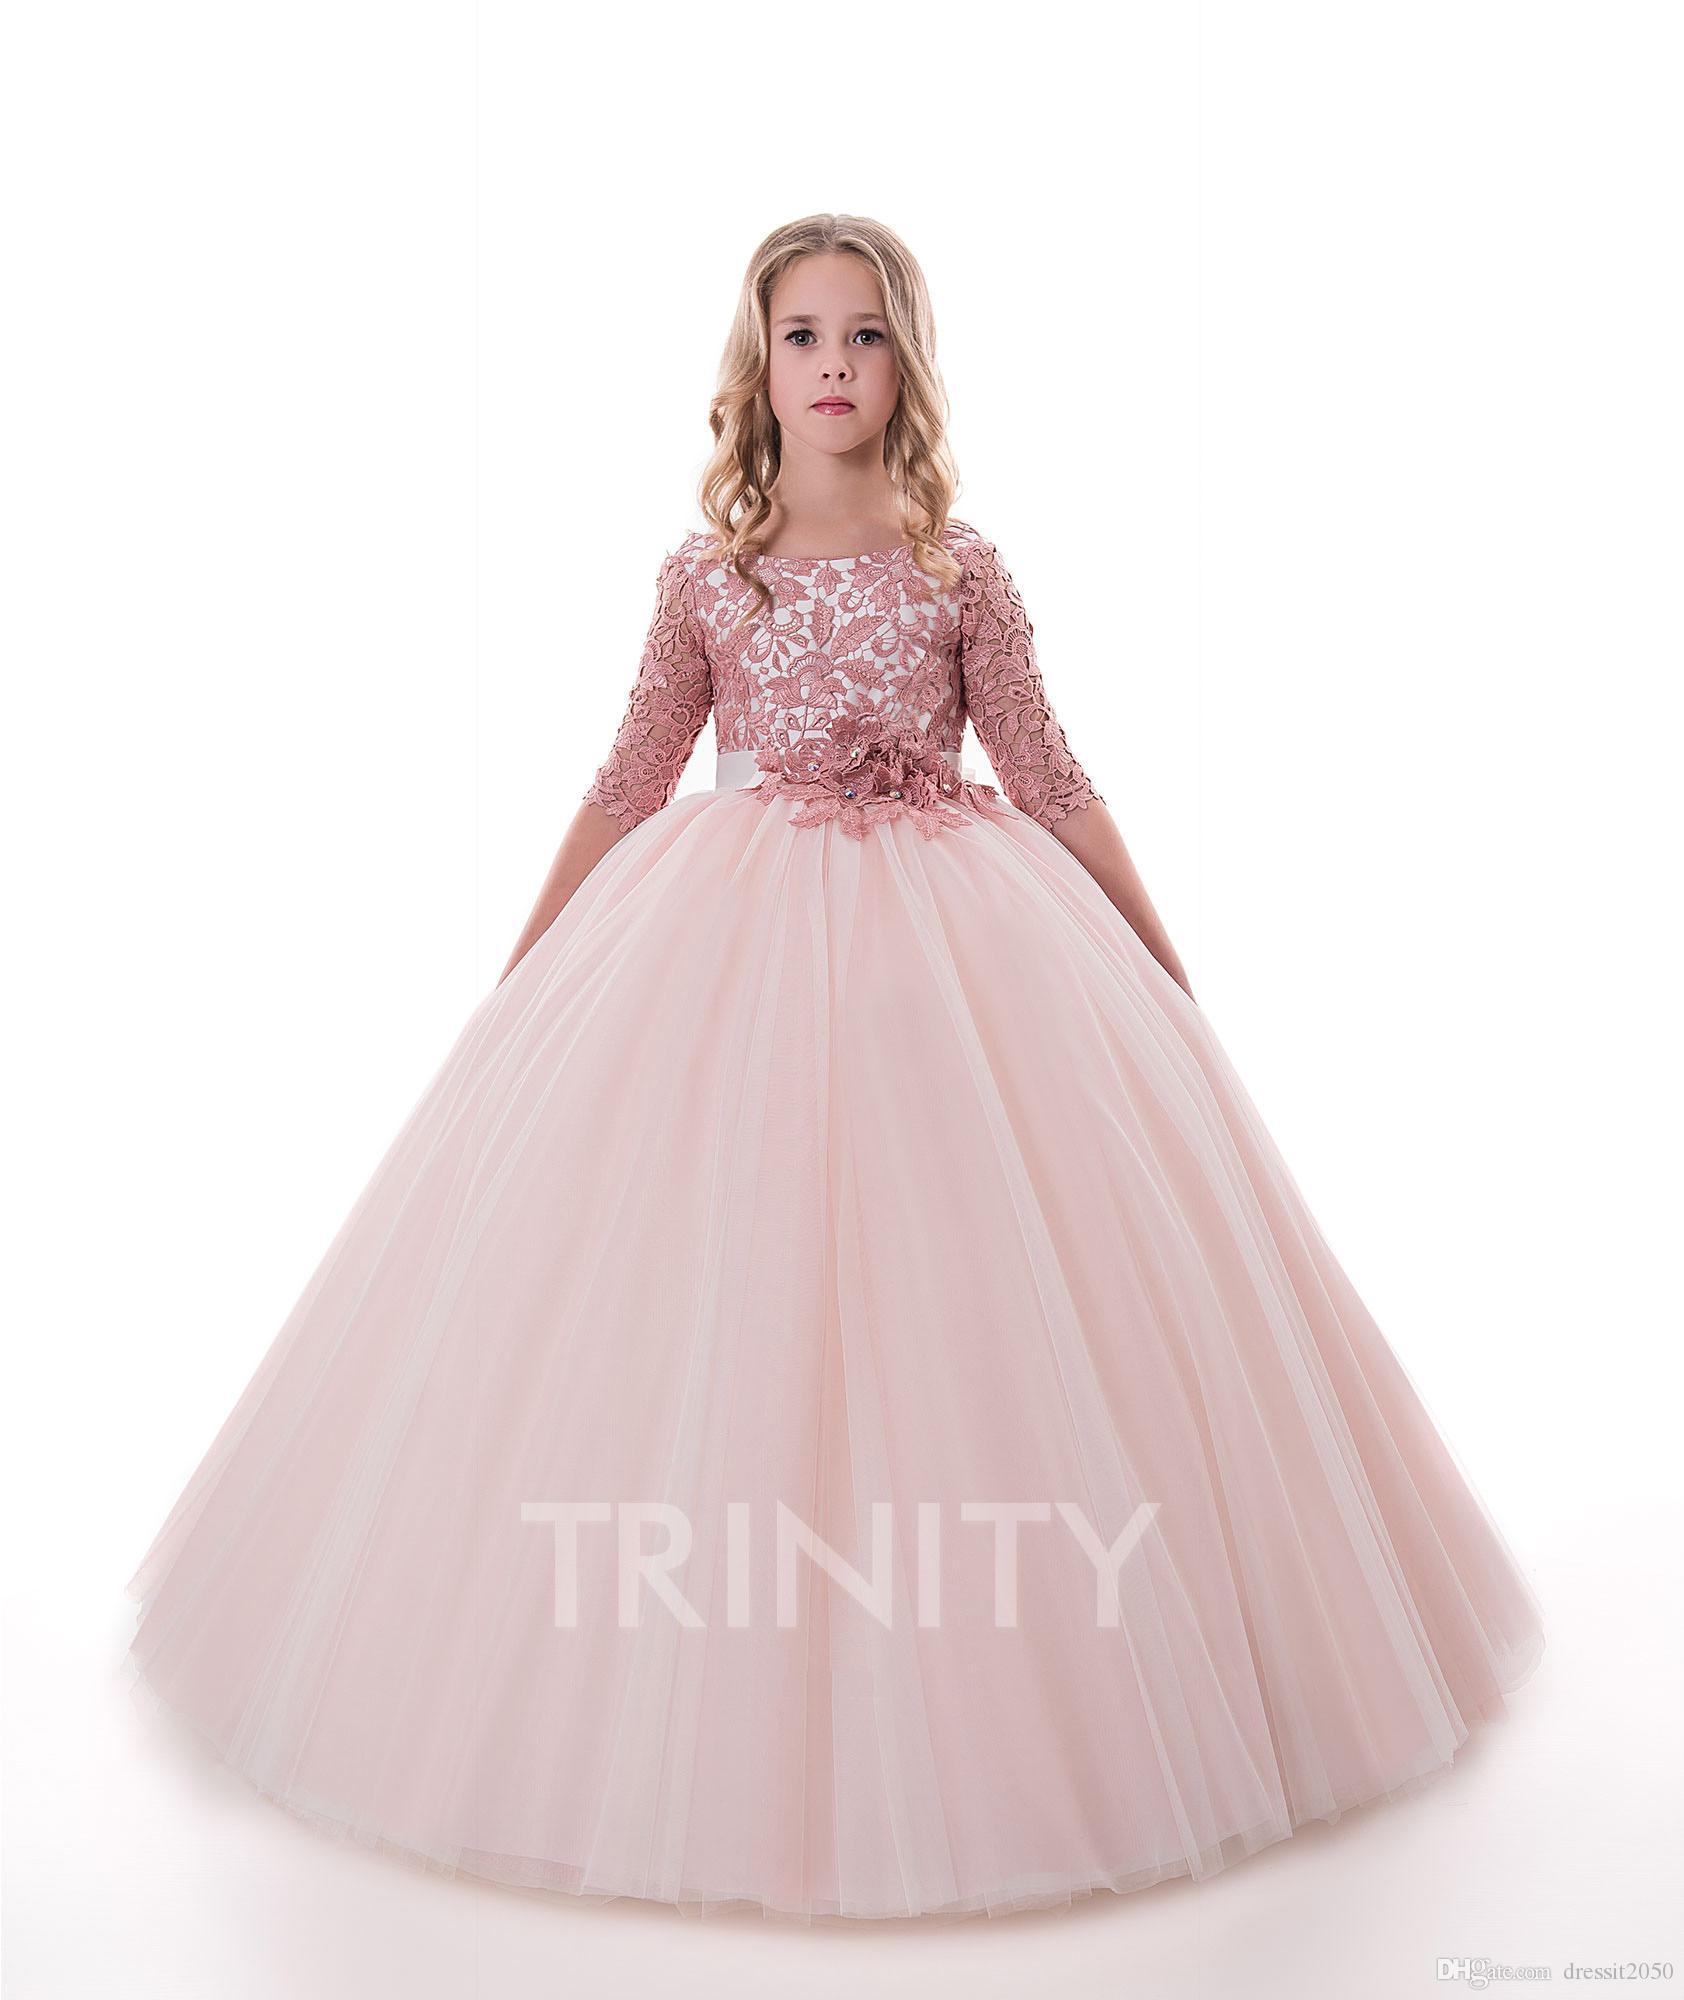 68267c04390d Lovely Pink Lace Tulle Sleeves Applique Flower Girl Dresses Girls' Pageant Dresses  Holidays/Birthday Dress/Skirt Custom Size 2 14 DF720493 Evening Dresses ...